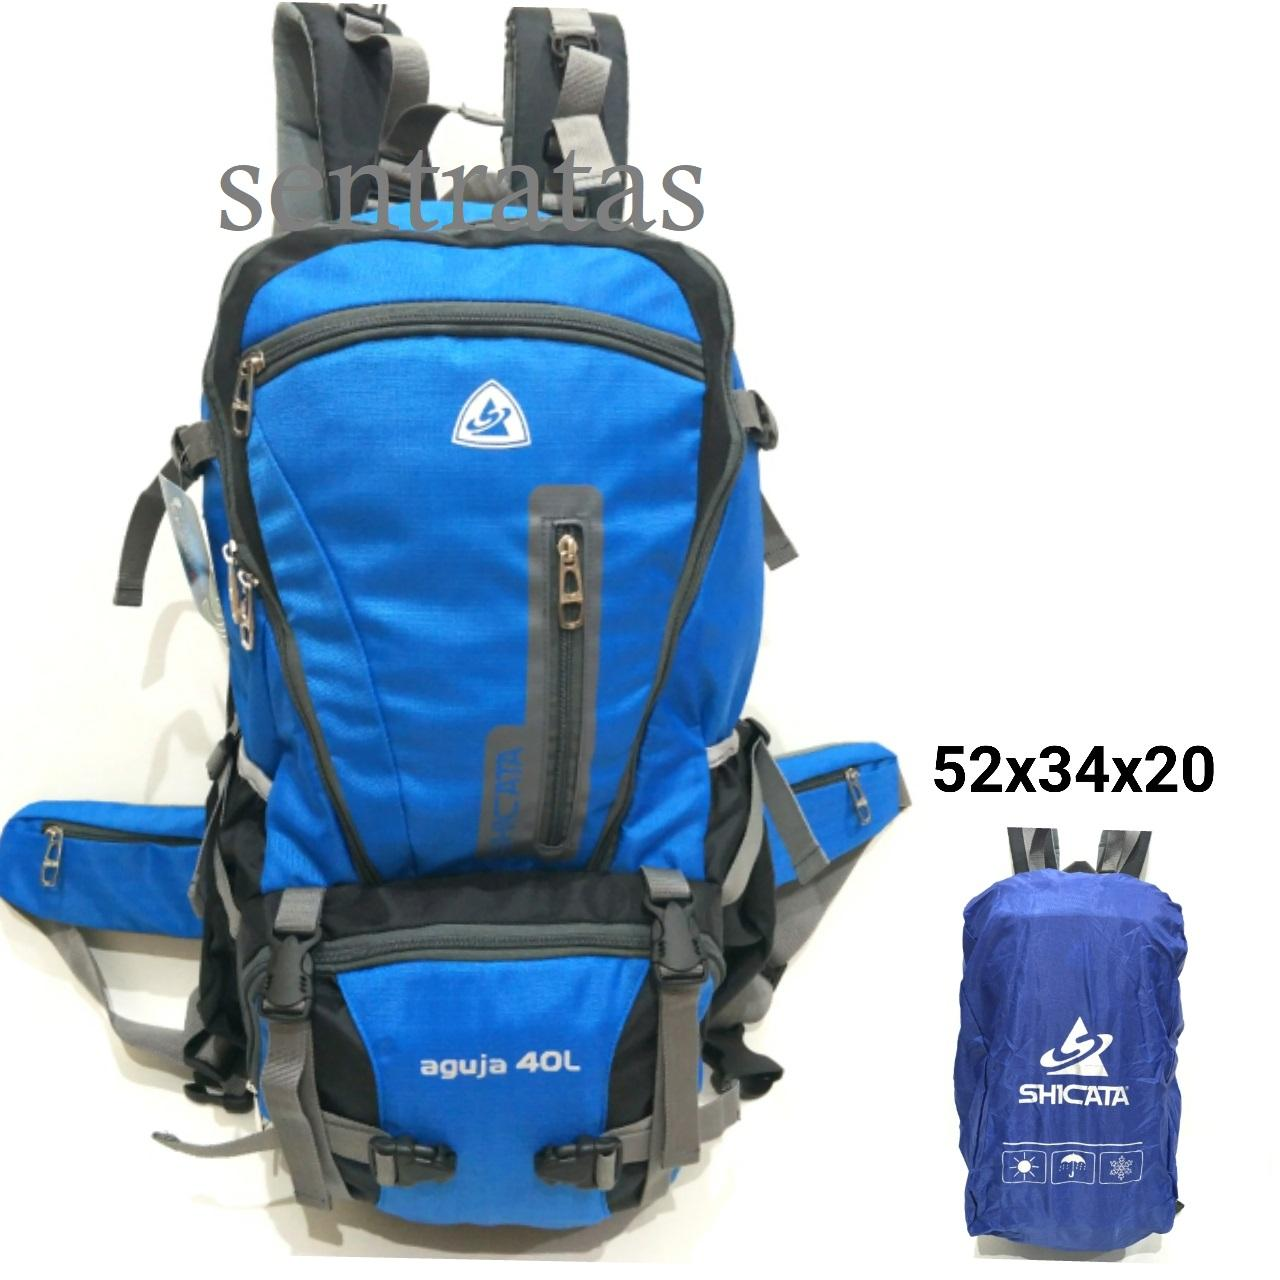 Dompet - Backpack - Tas - Koper Shicata 4c6863001f